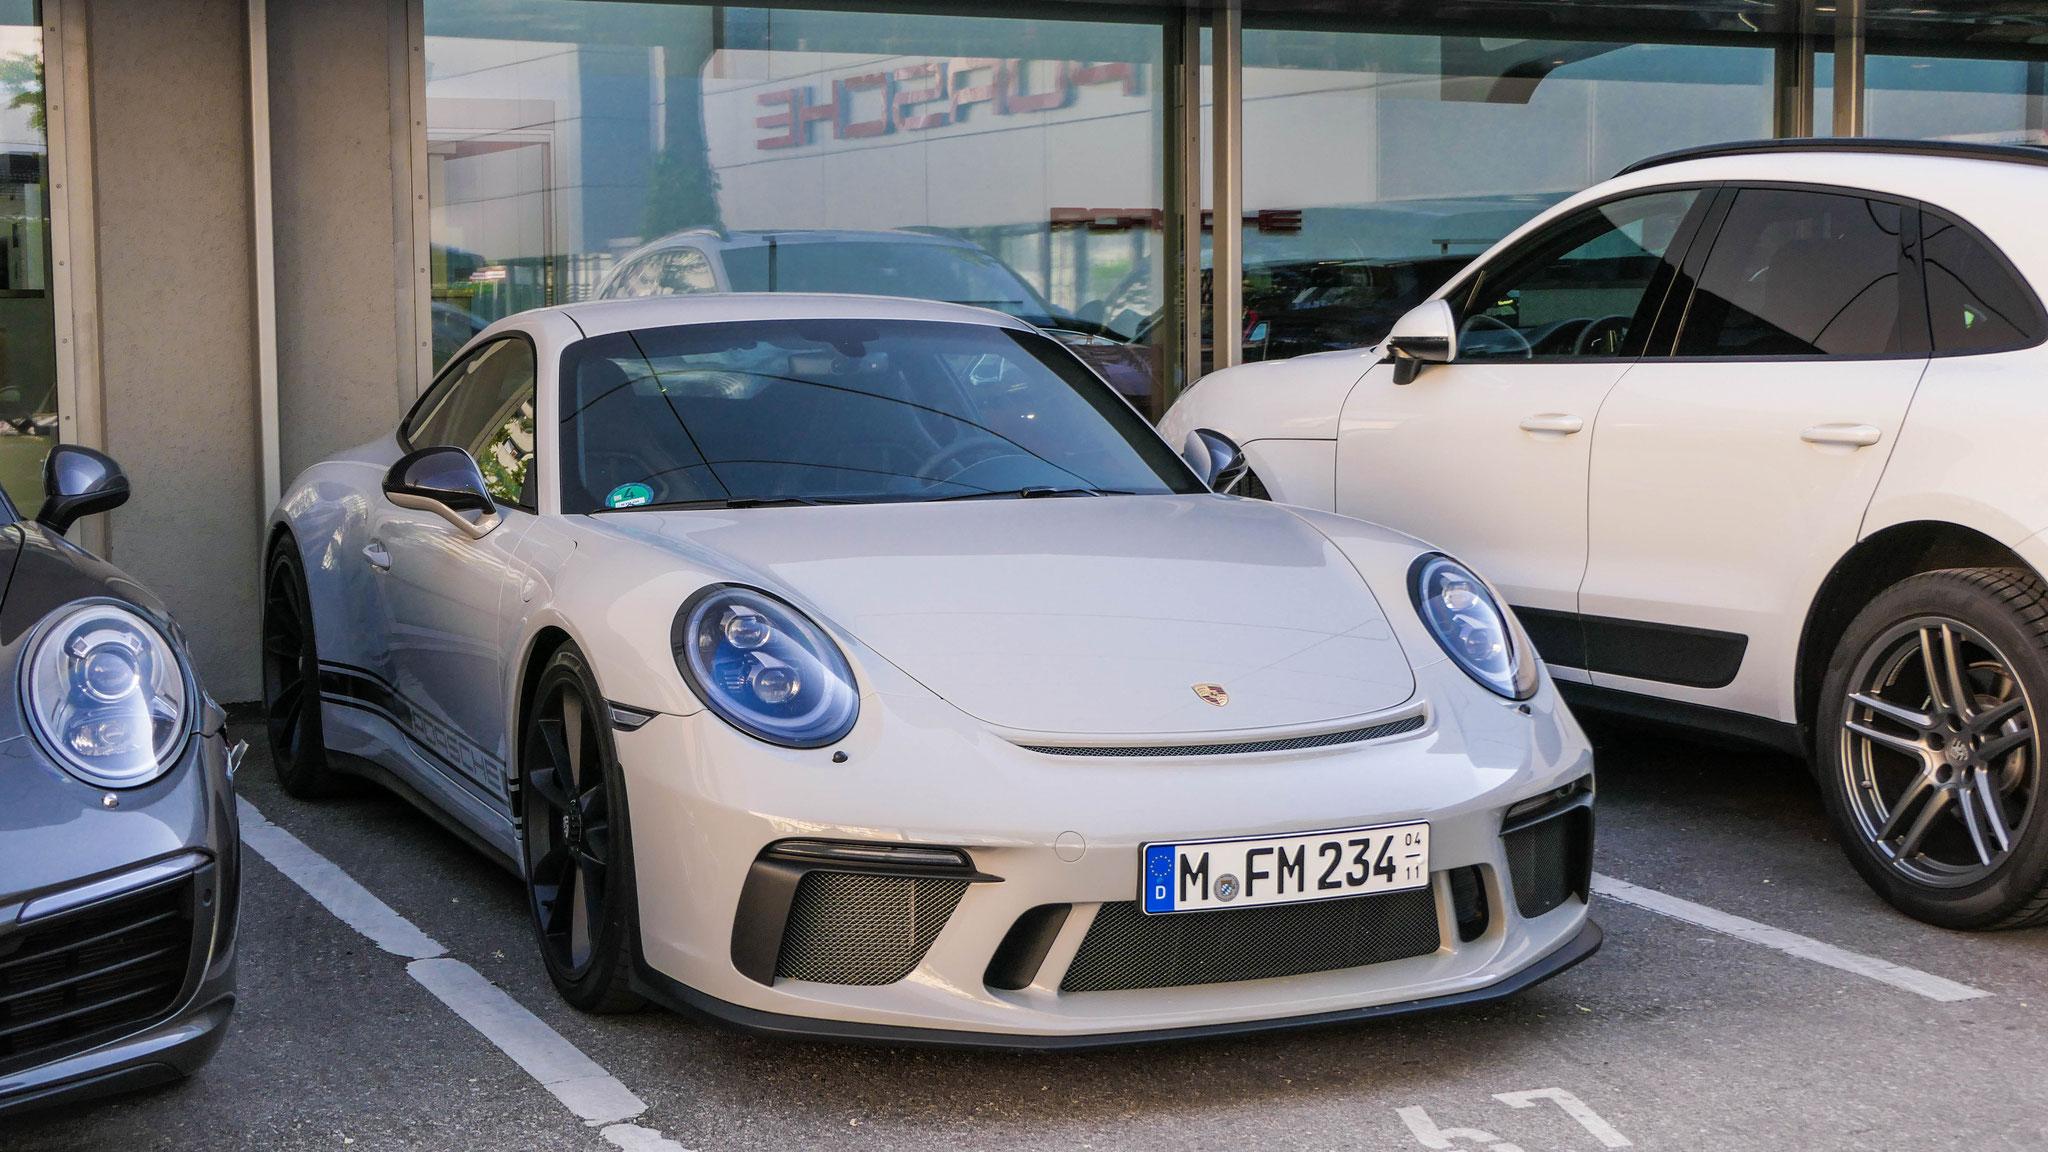 Porsche 991 GT3 Touring Package - M-FM-234